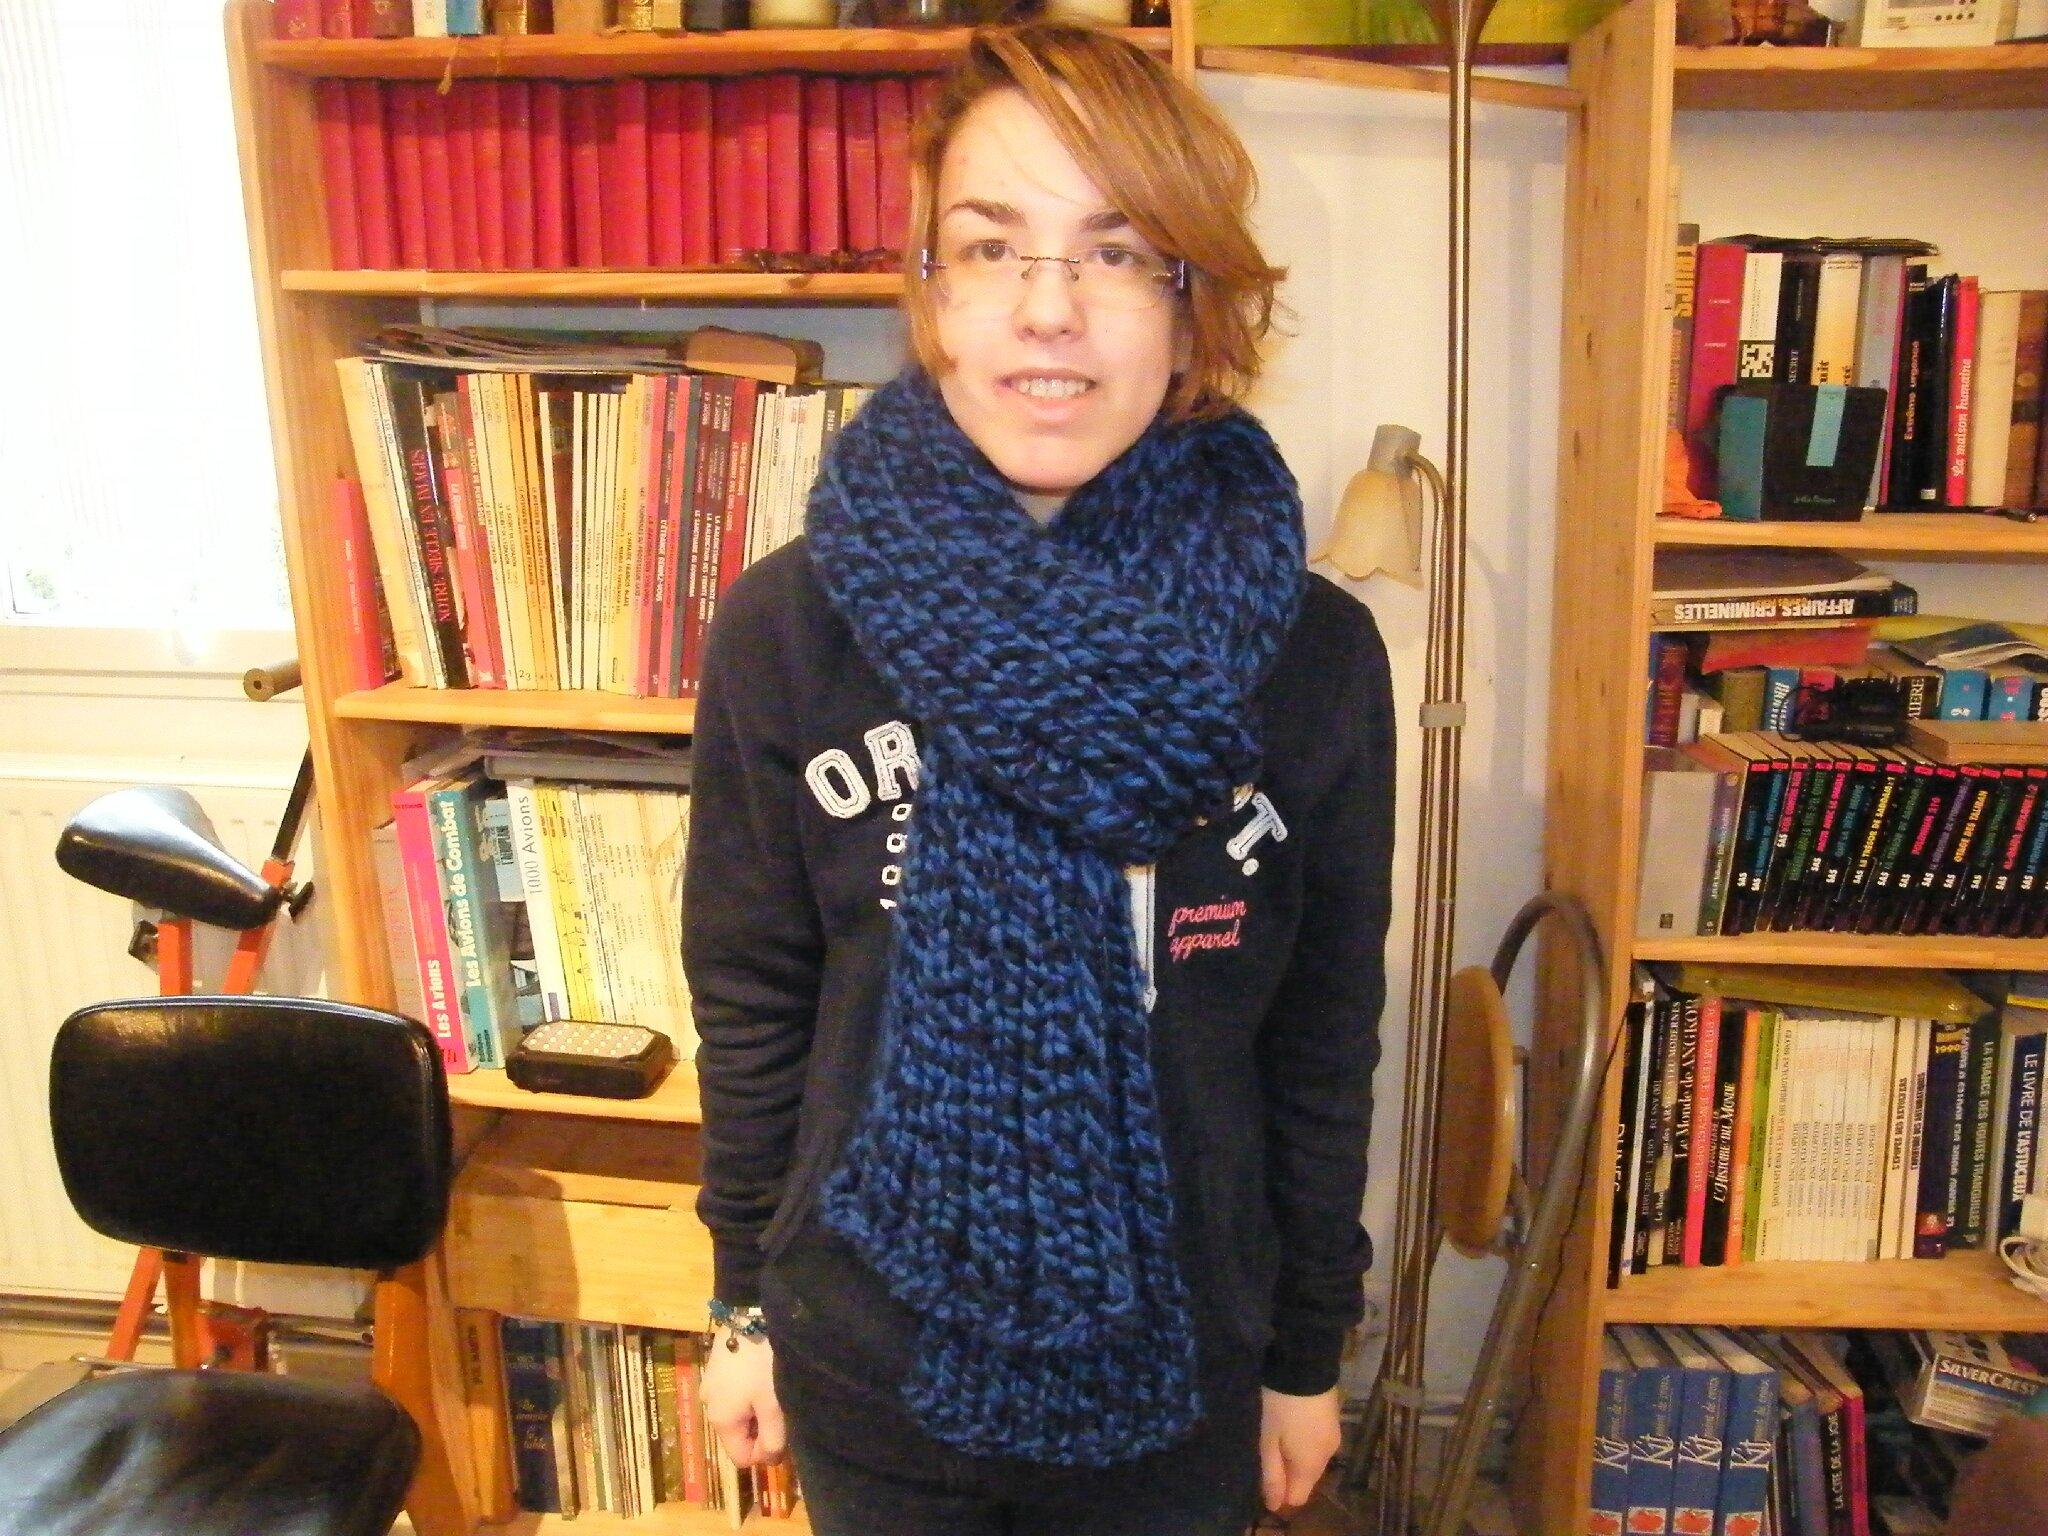 grosse écharpe bleu foncée